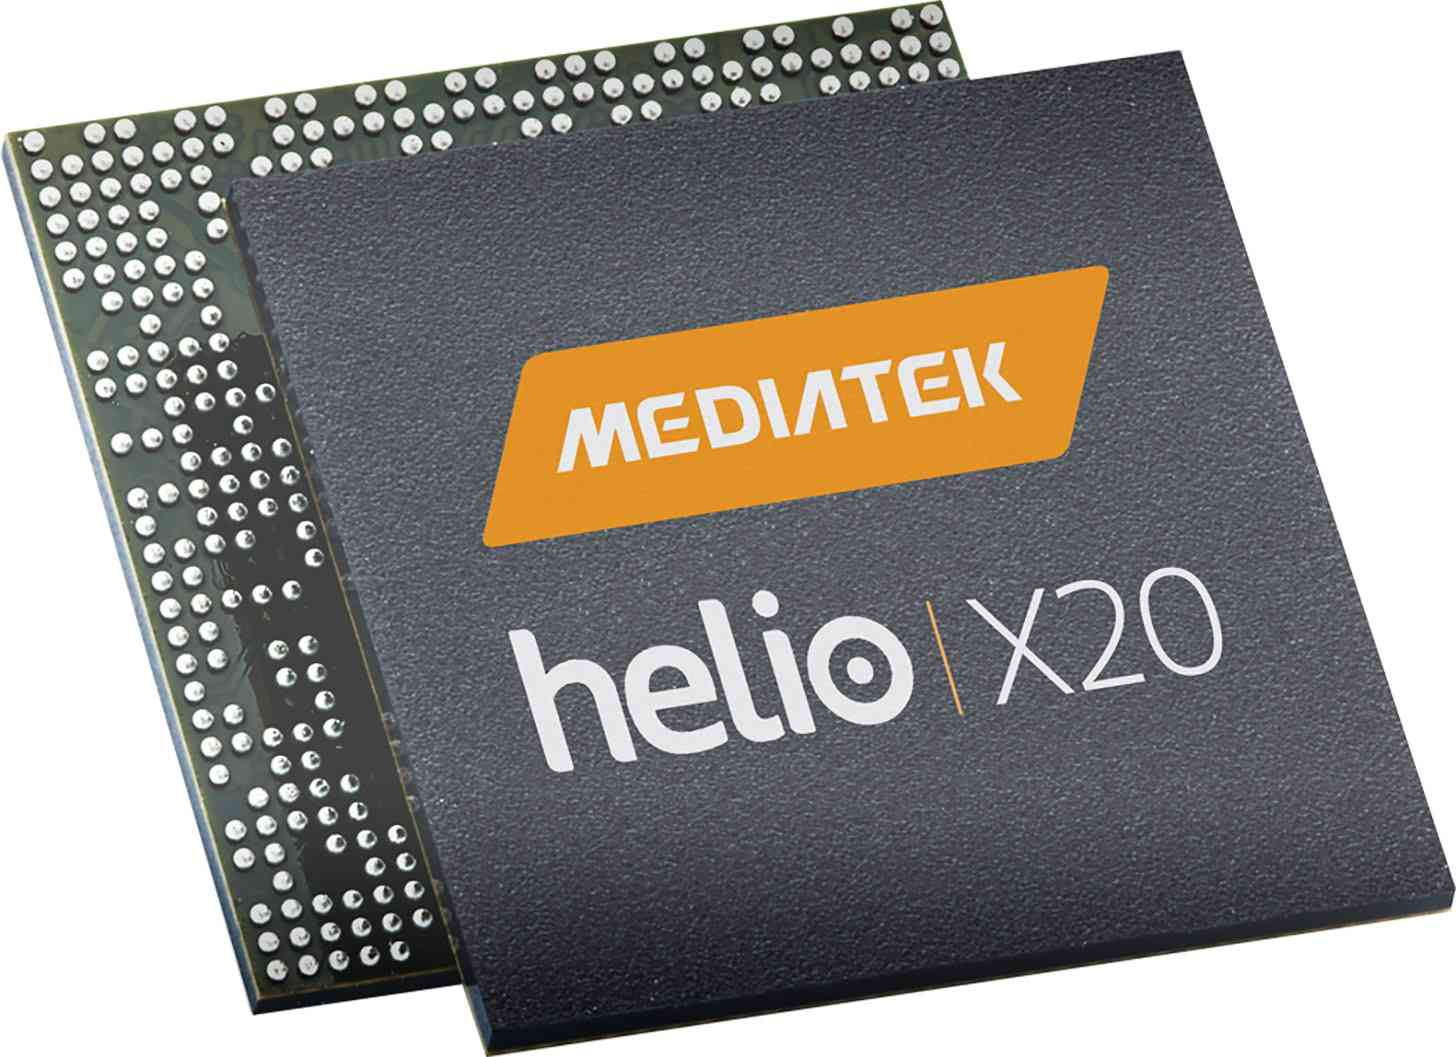 MediaTek Helio X20 10-core deca-core processor official